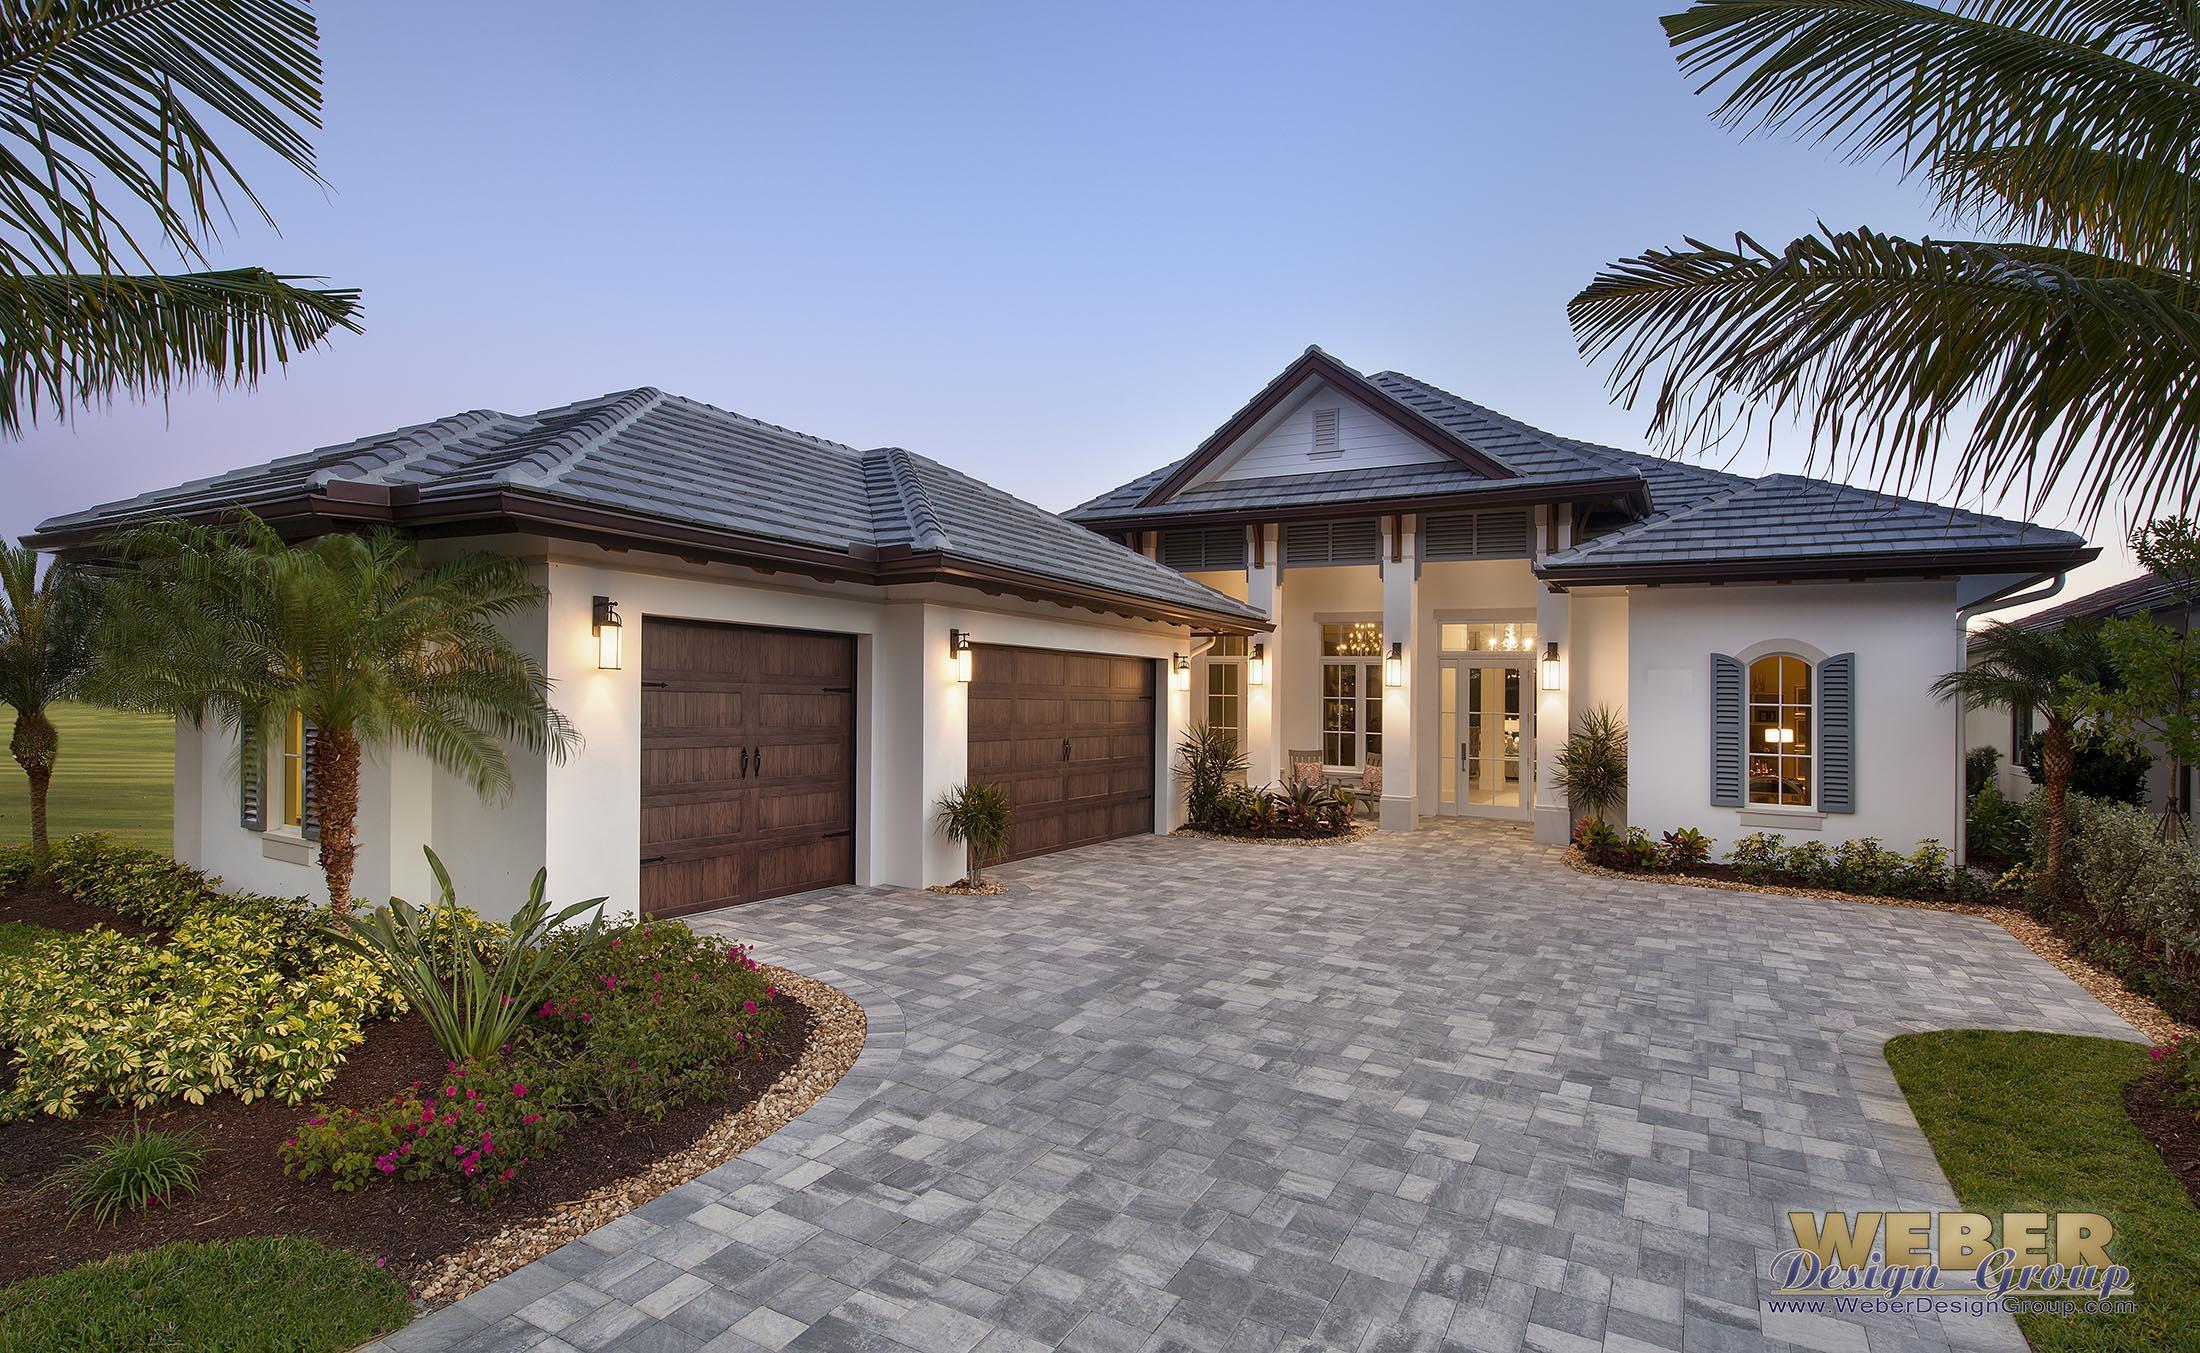 Small Mediterranean Home Designs